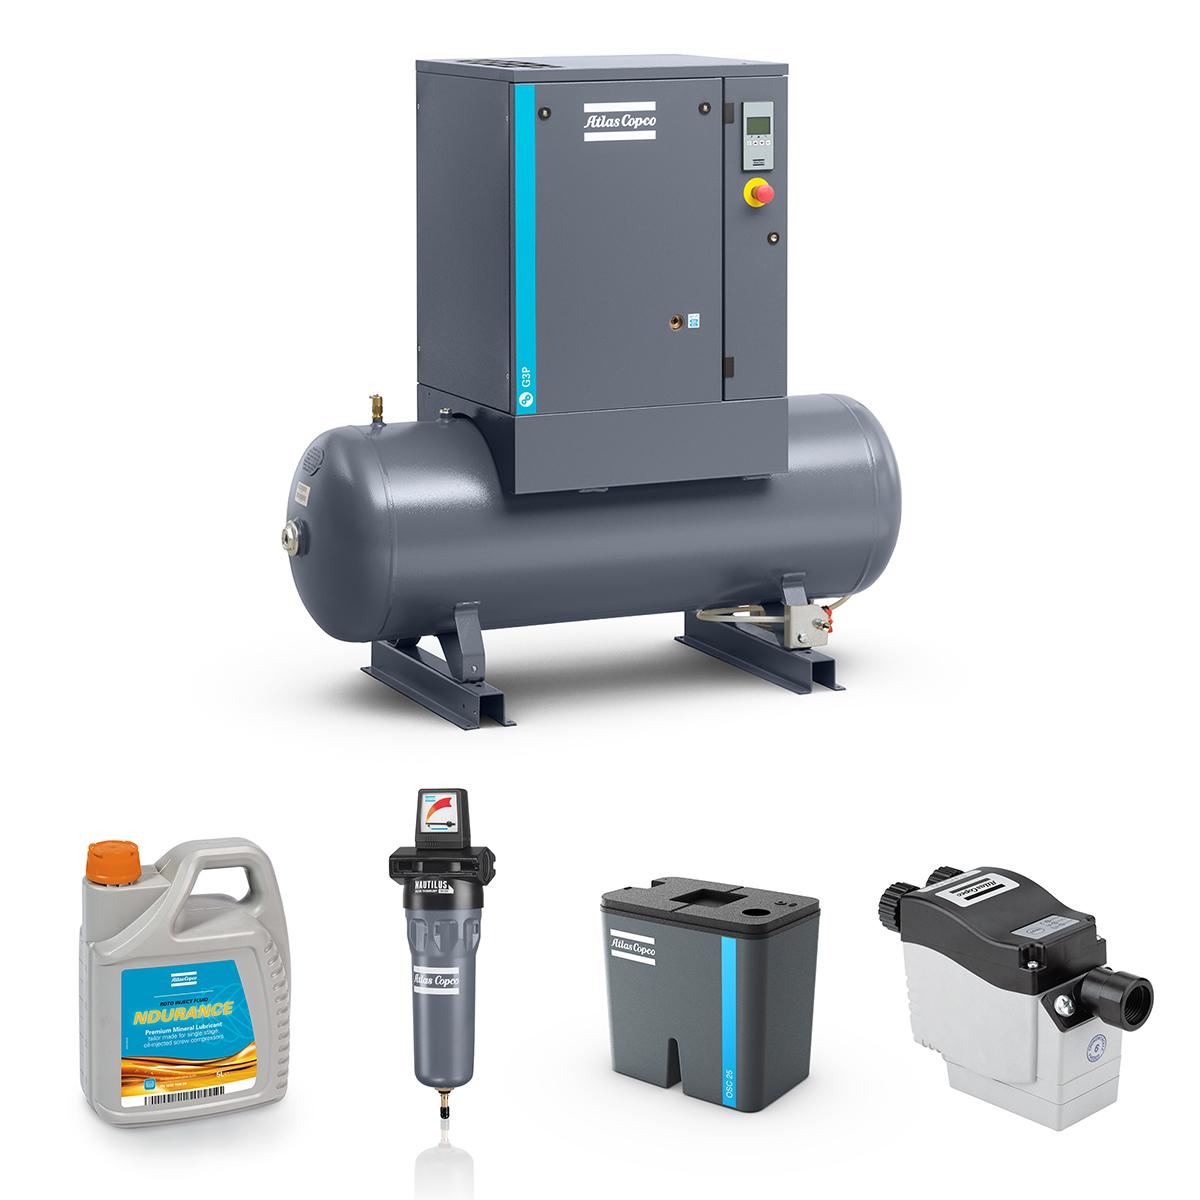 4kW Screw Compressed Air Bundle: Compressor, Separator, Filter, Drain, Oil